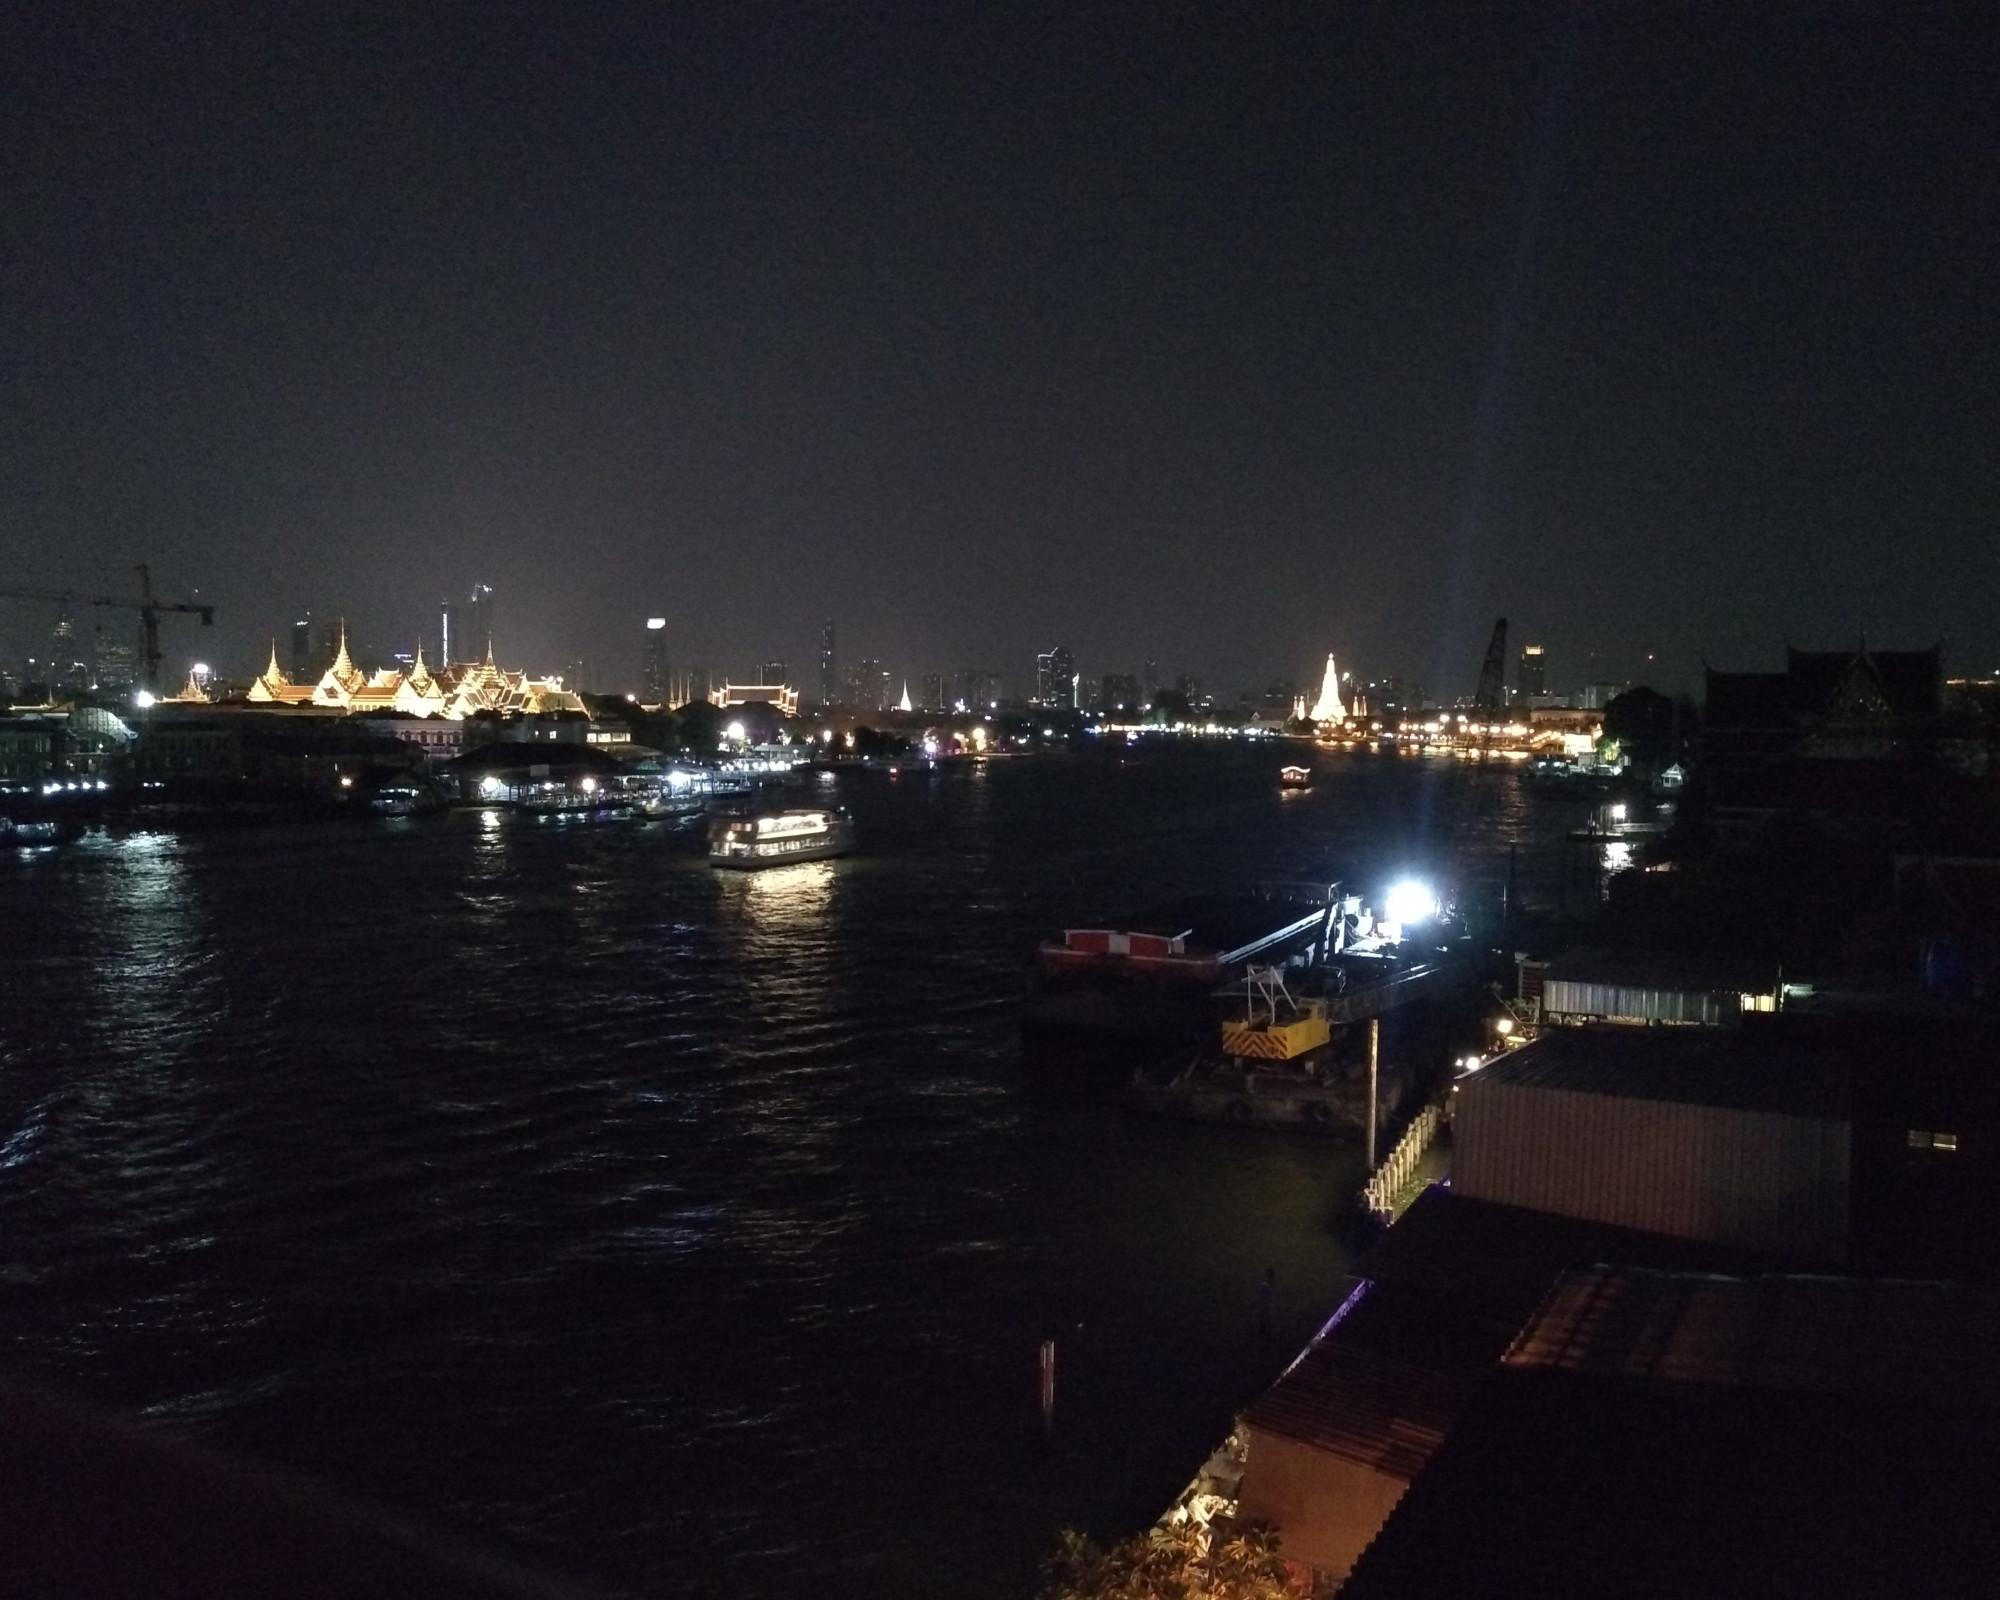 Photo 2: Baan Wanglang Riverside